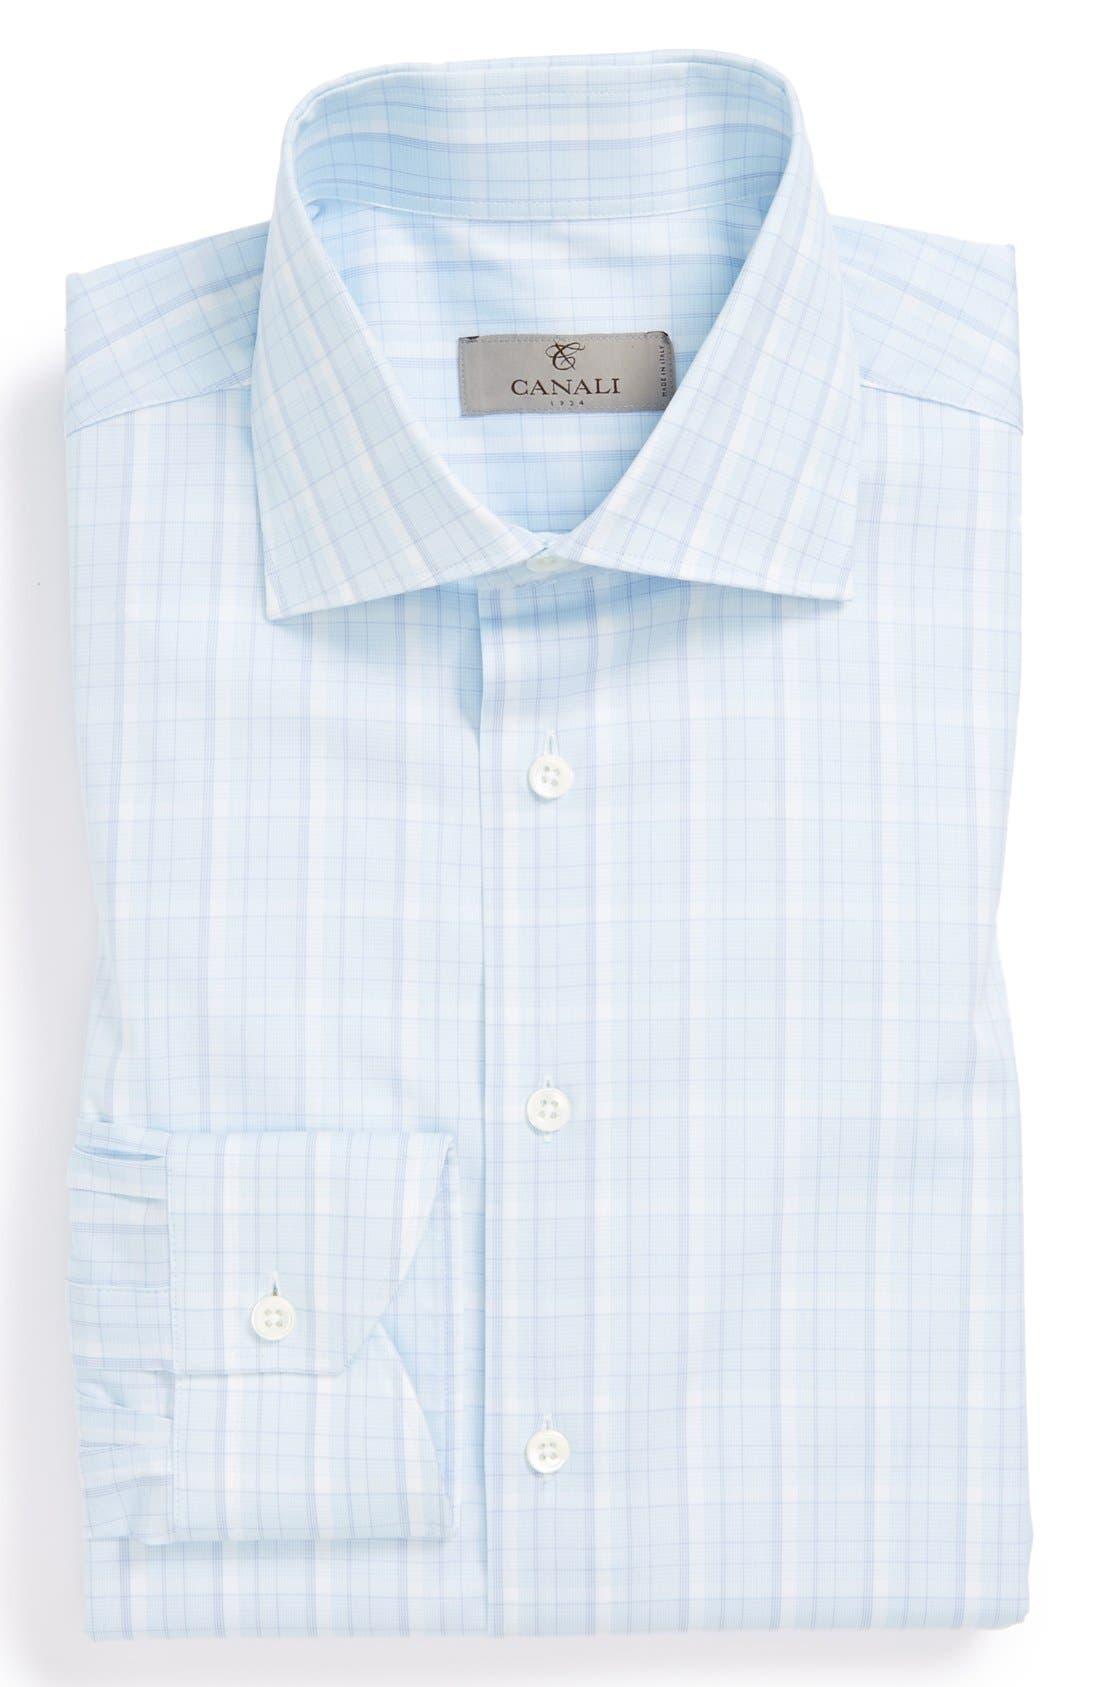 Main Image - Canali Poplin Graph Check Regular Fit Dress Shirt